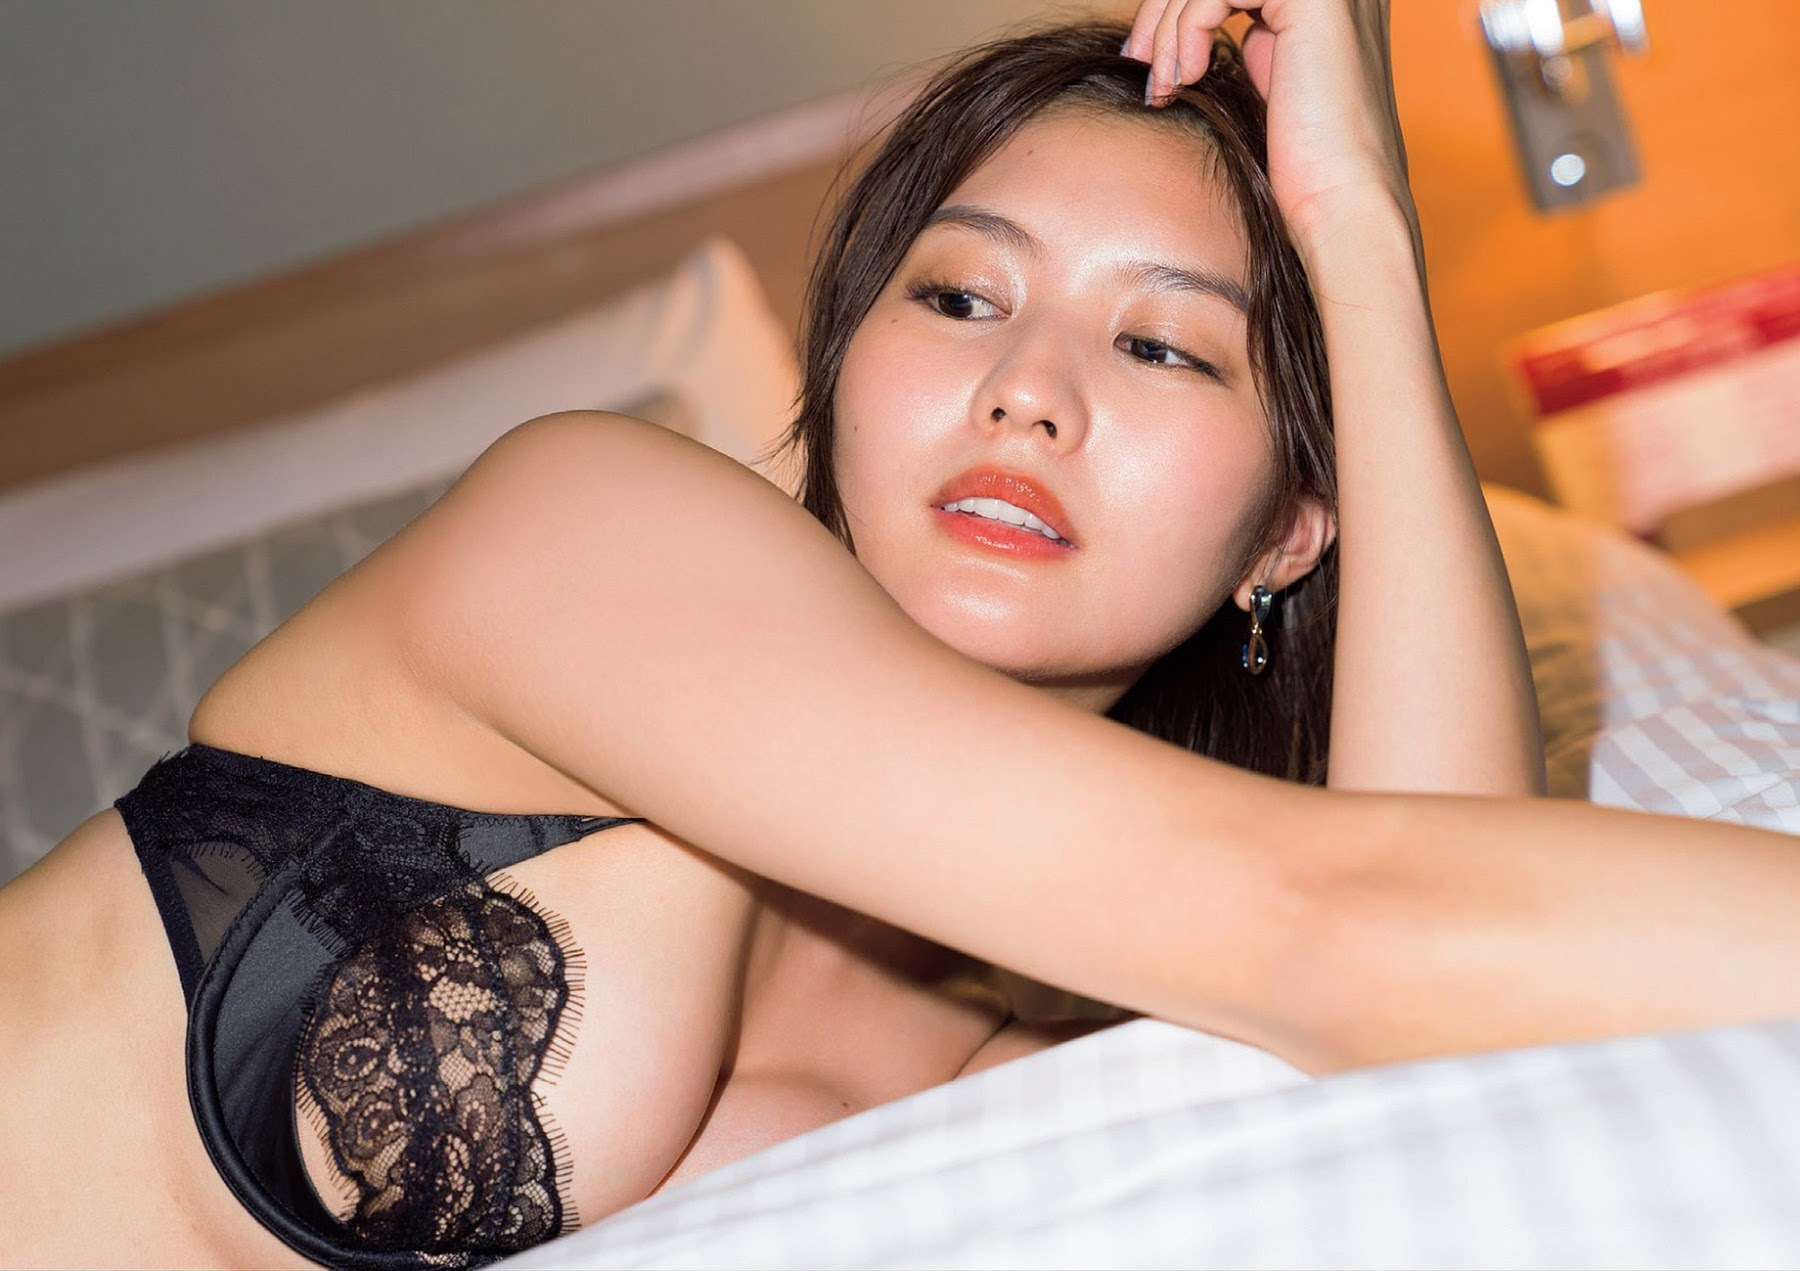 今田美樱-WEEKLY PLAYBOY 2021年第二十四期  高清套图 第39张